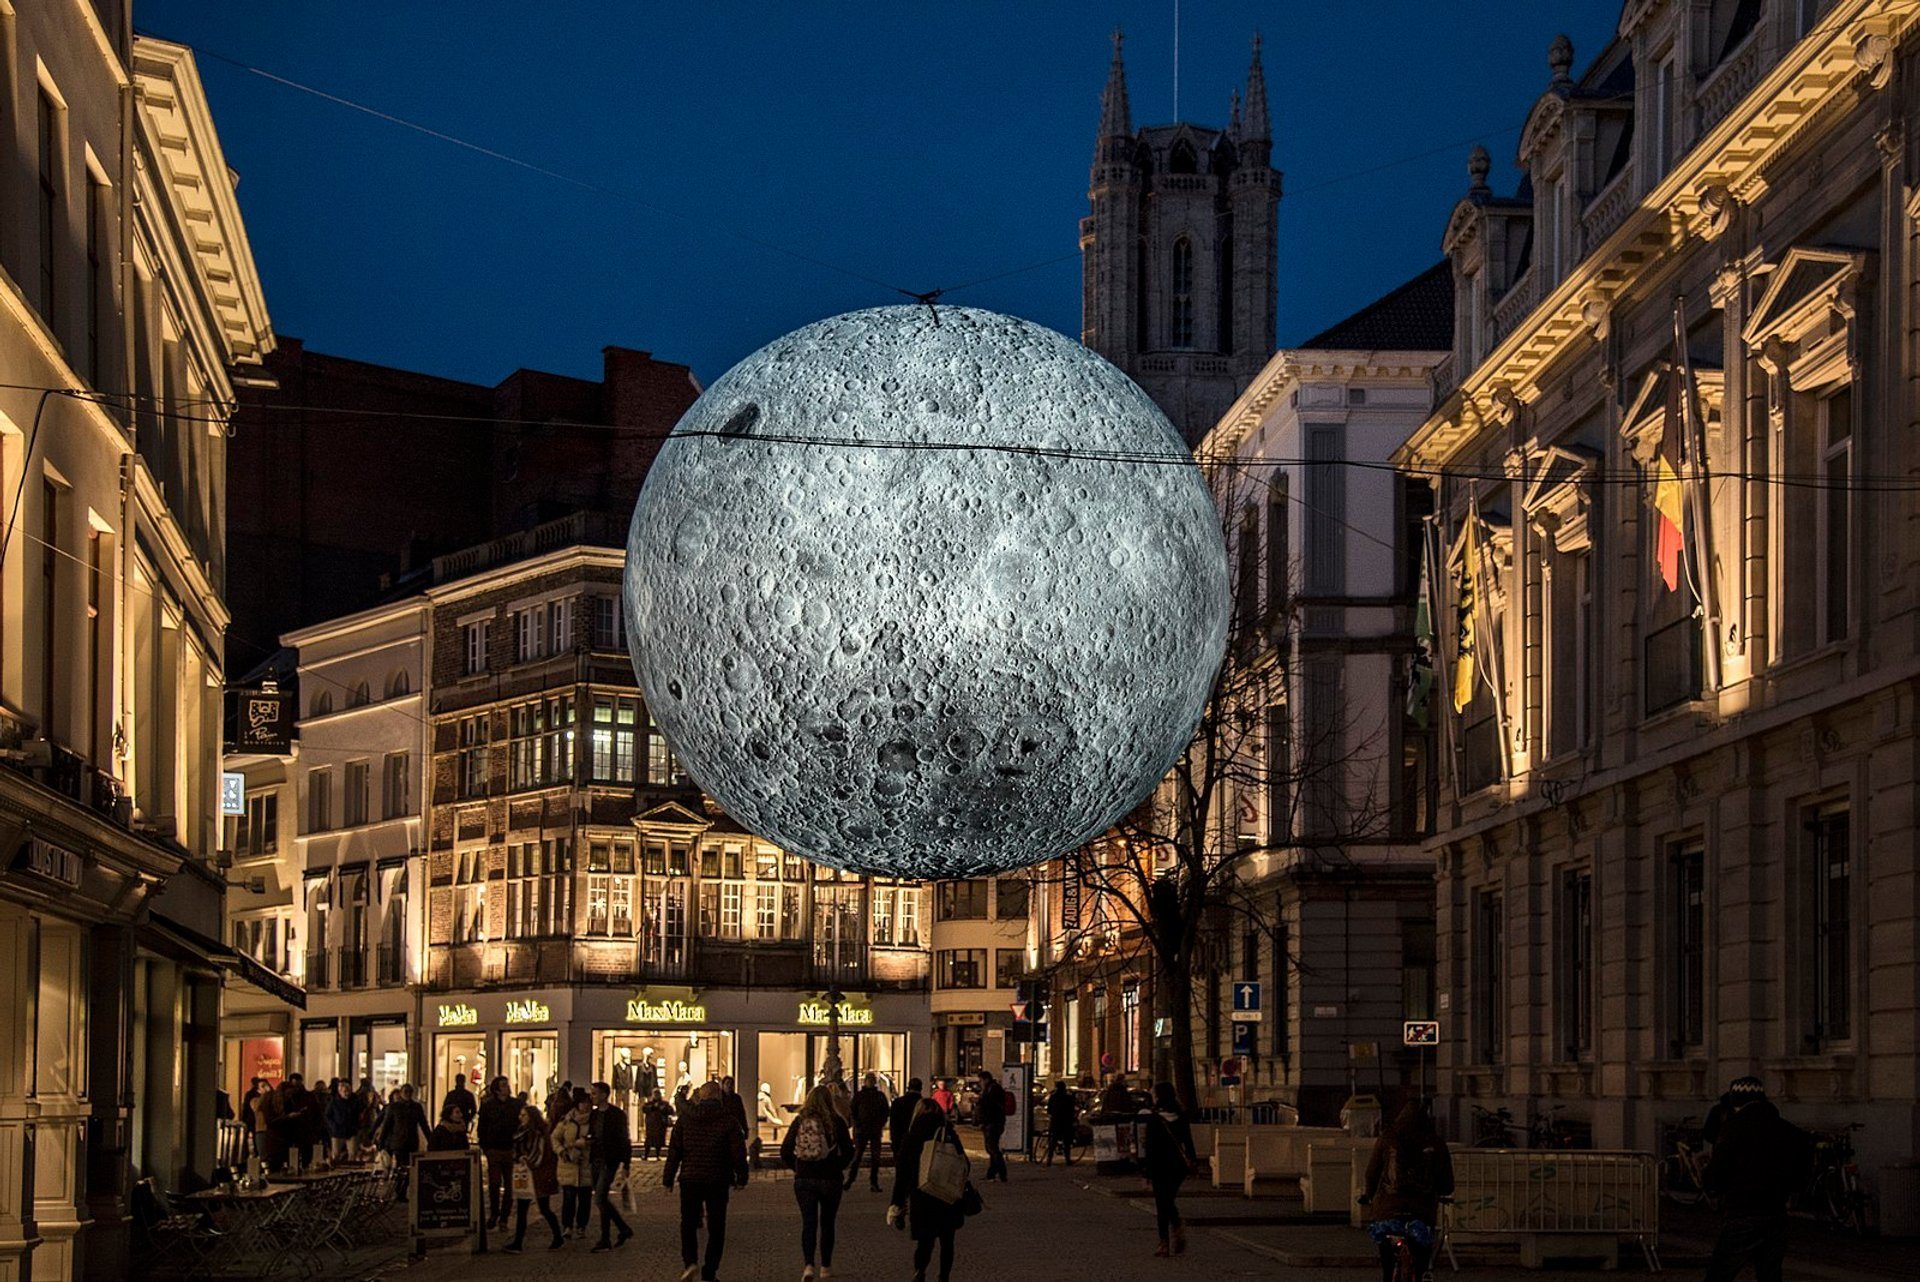 Ghent Light Festival in Belgium 2020 - Best Time